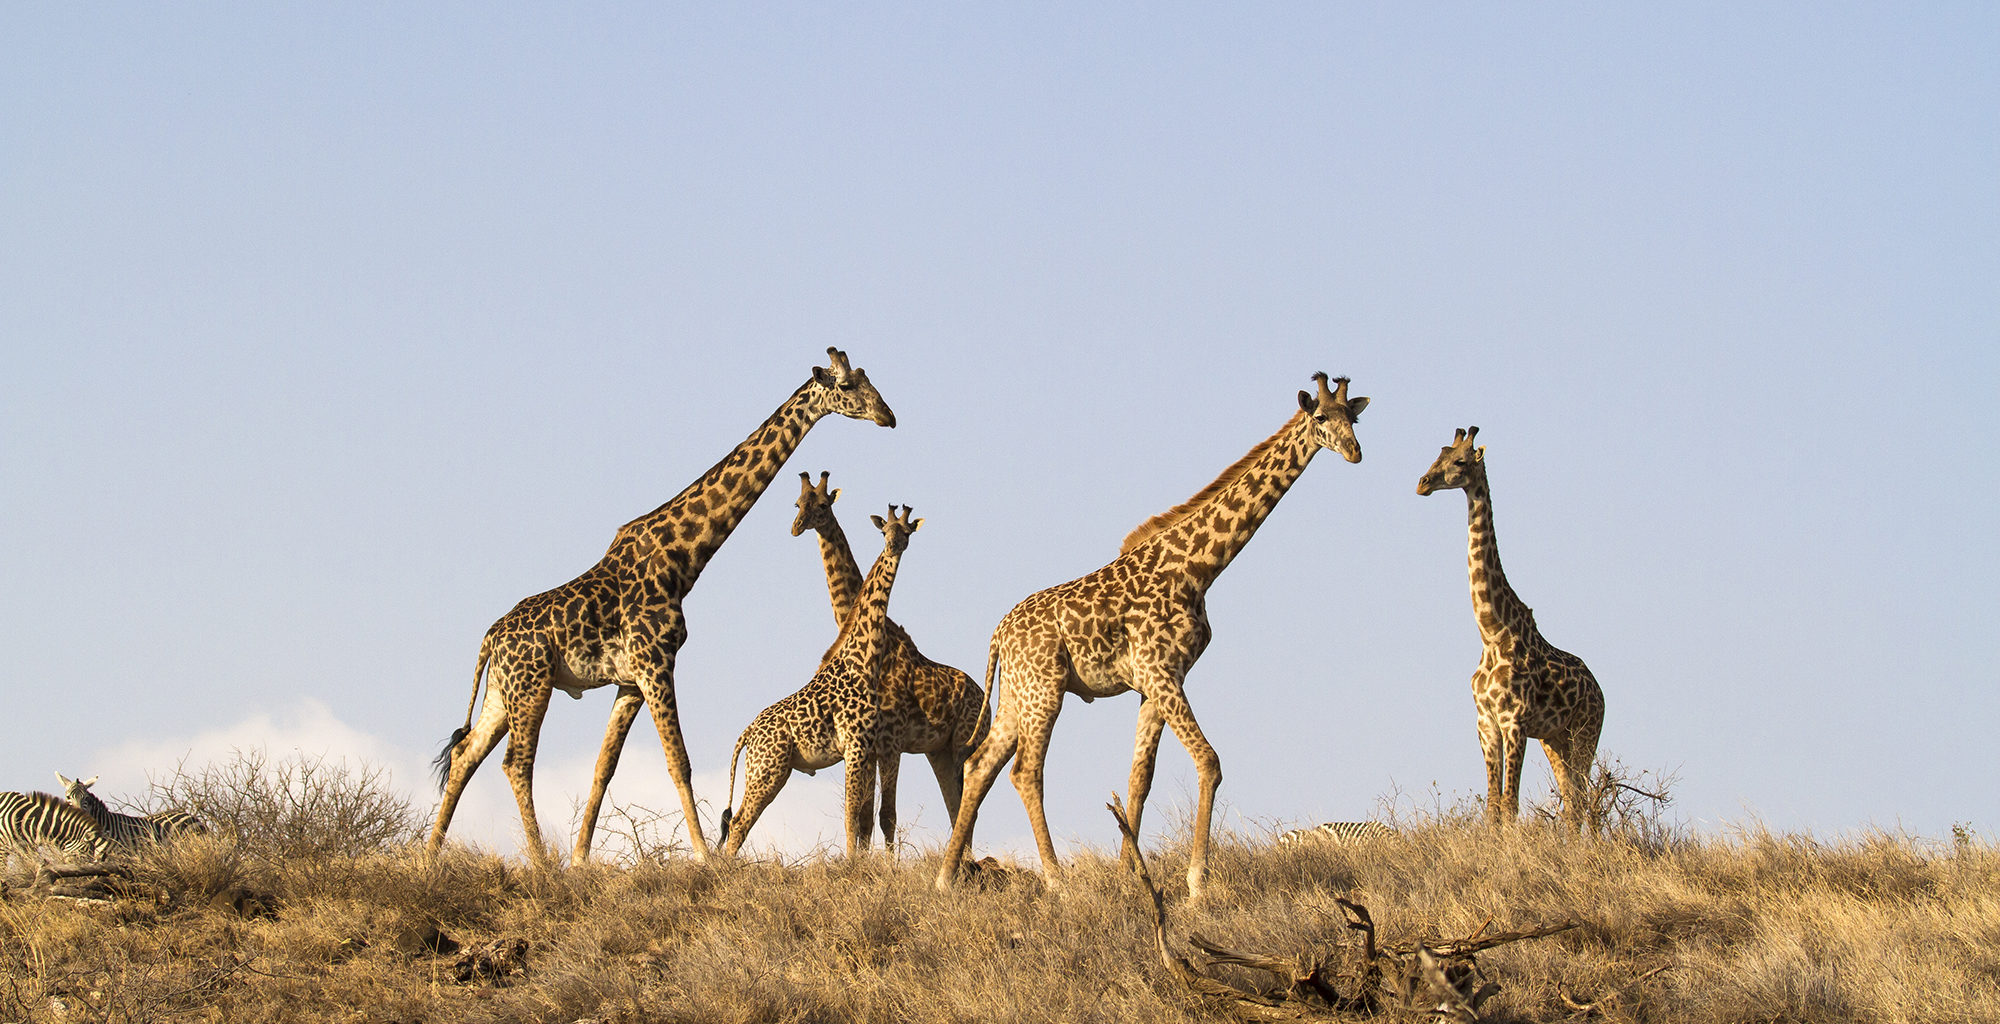 Tanzania-West-Kilimanjaro-Giraffe